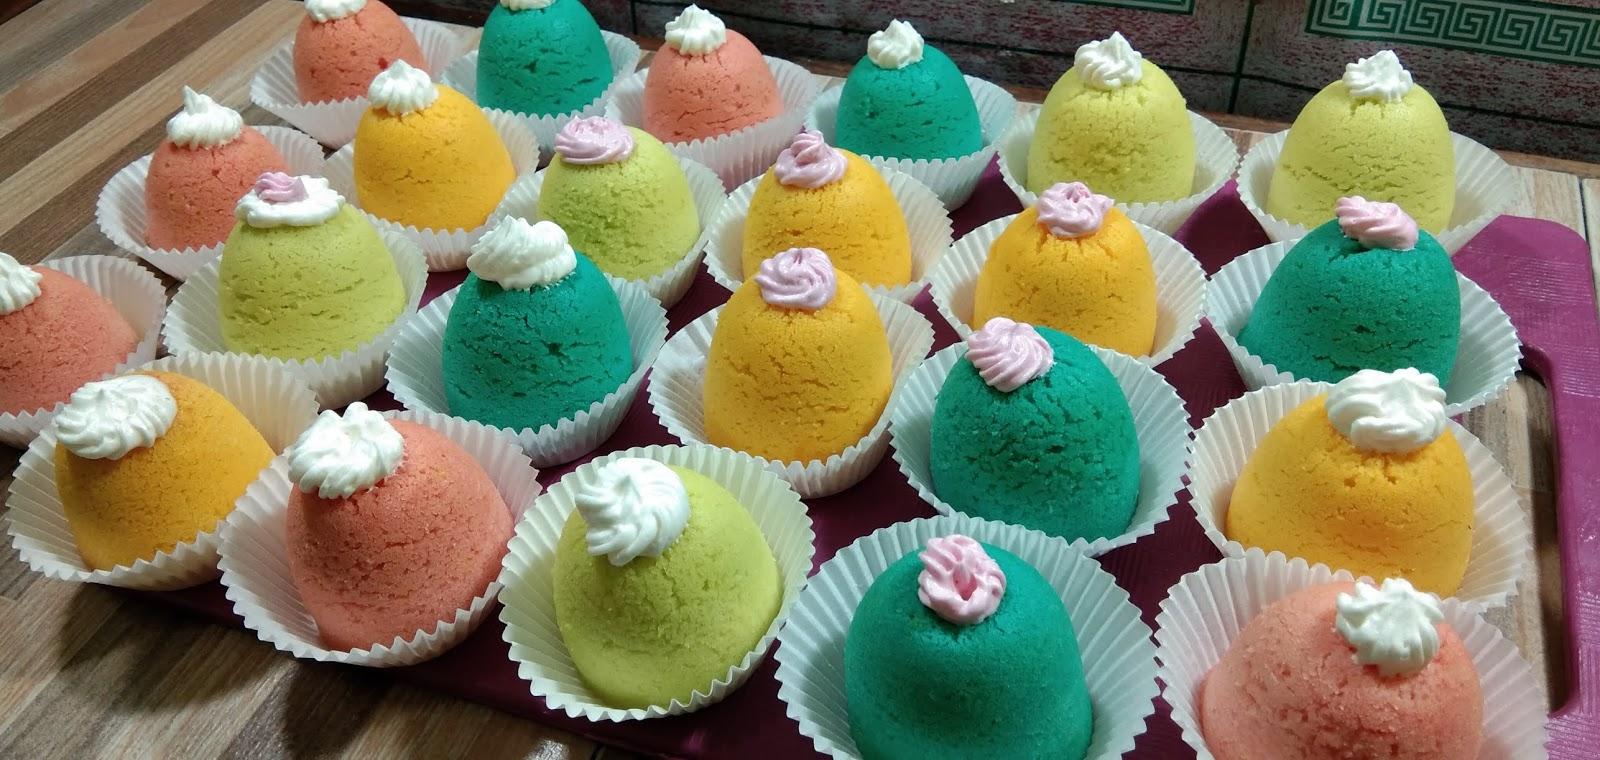 Ternyata Mudah Banget Ini Resep Dan Cara Membuat Kue Bolnut Yang Lagi Viral